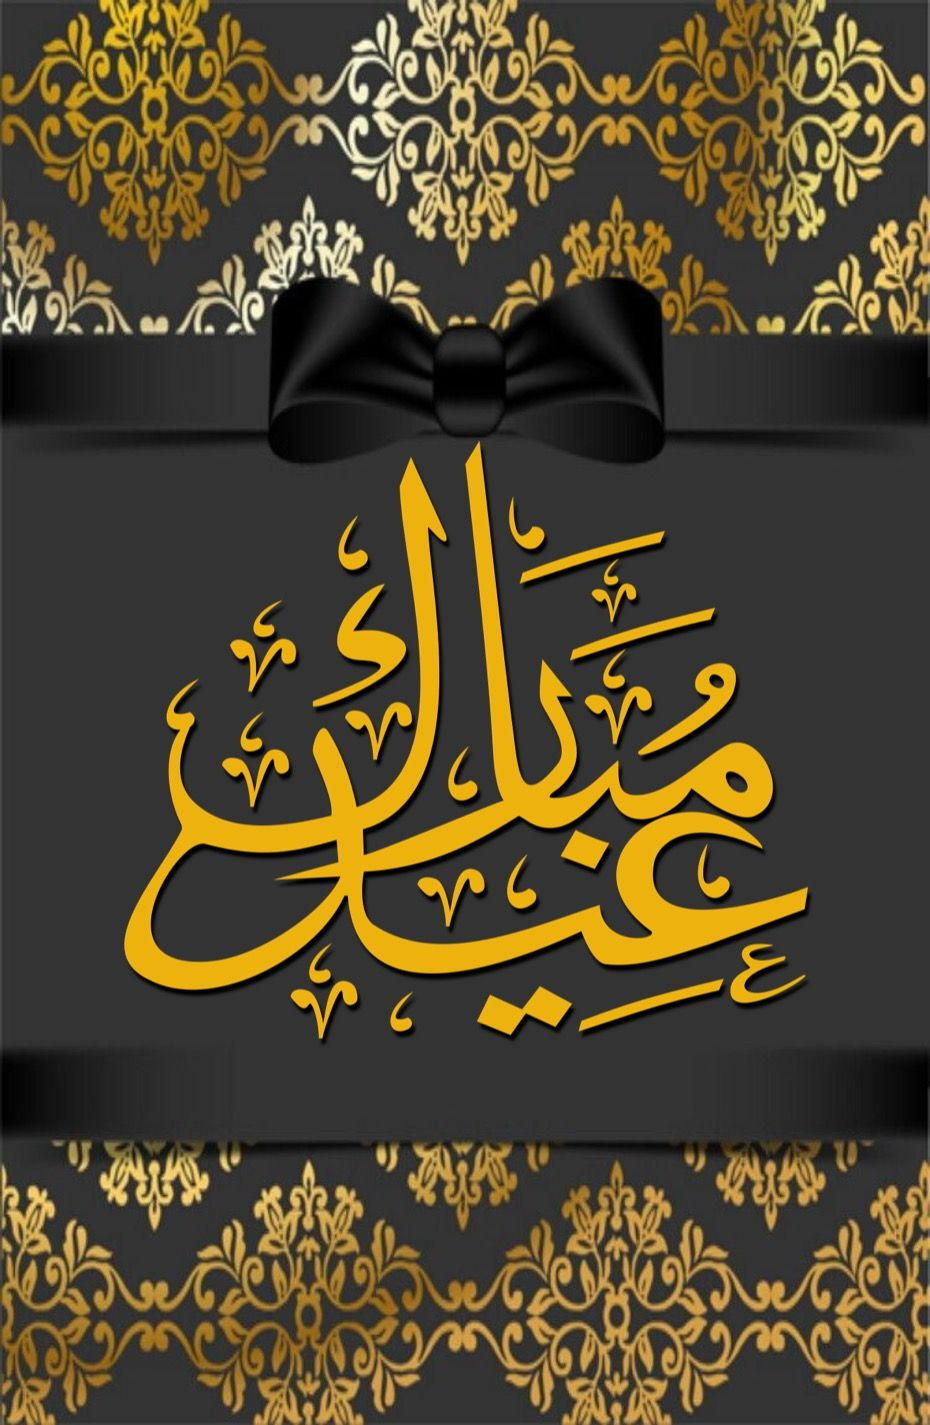 Desertrose كل عام وأنتم بخير Eid Mubarak Greetings Eid Greetings Eid Mubarak Greeting Cards